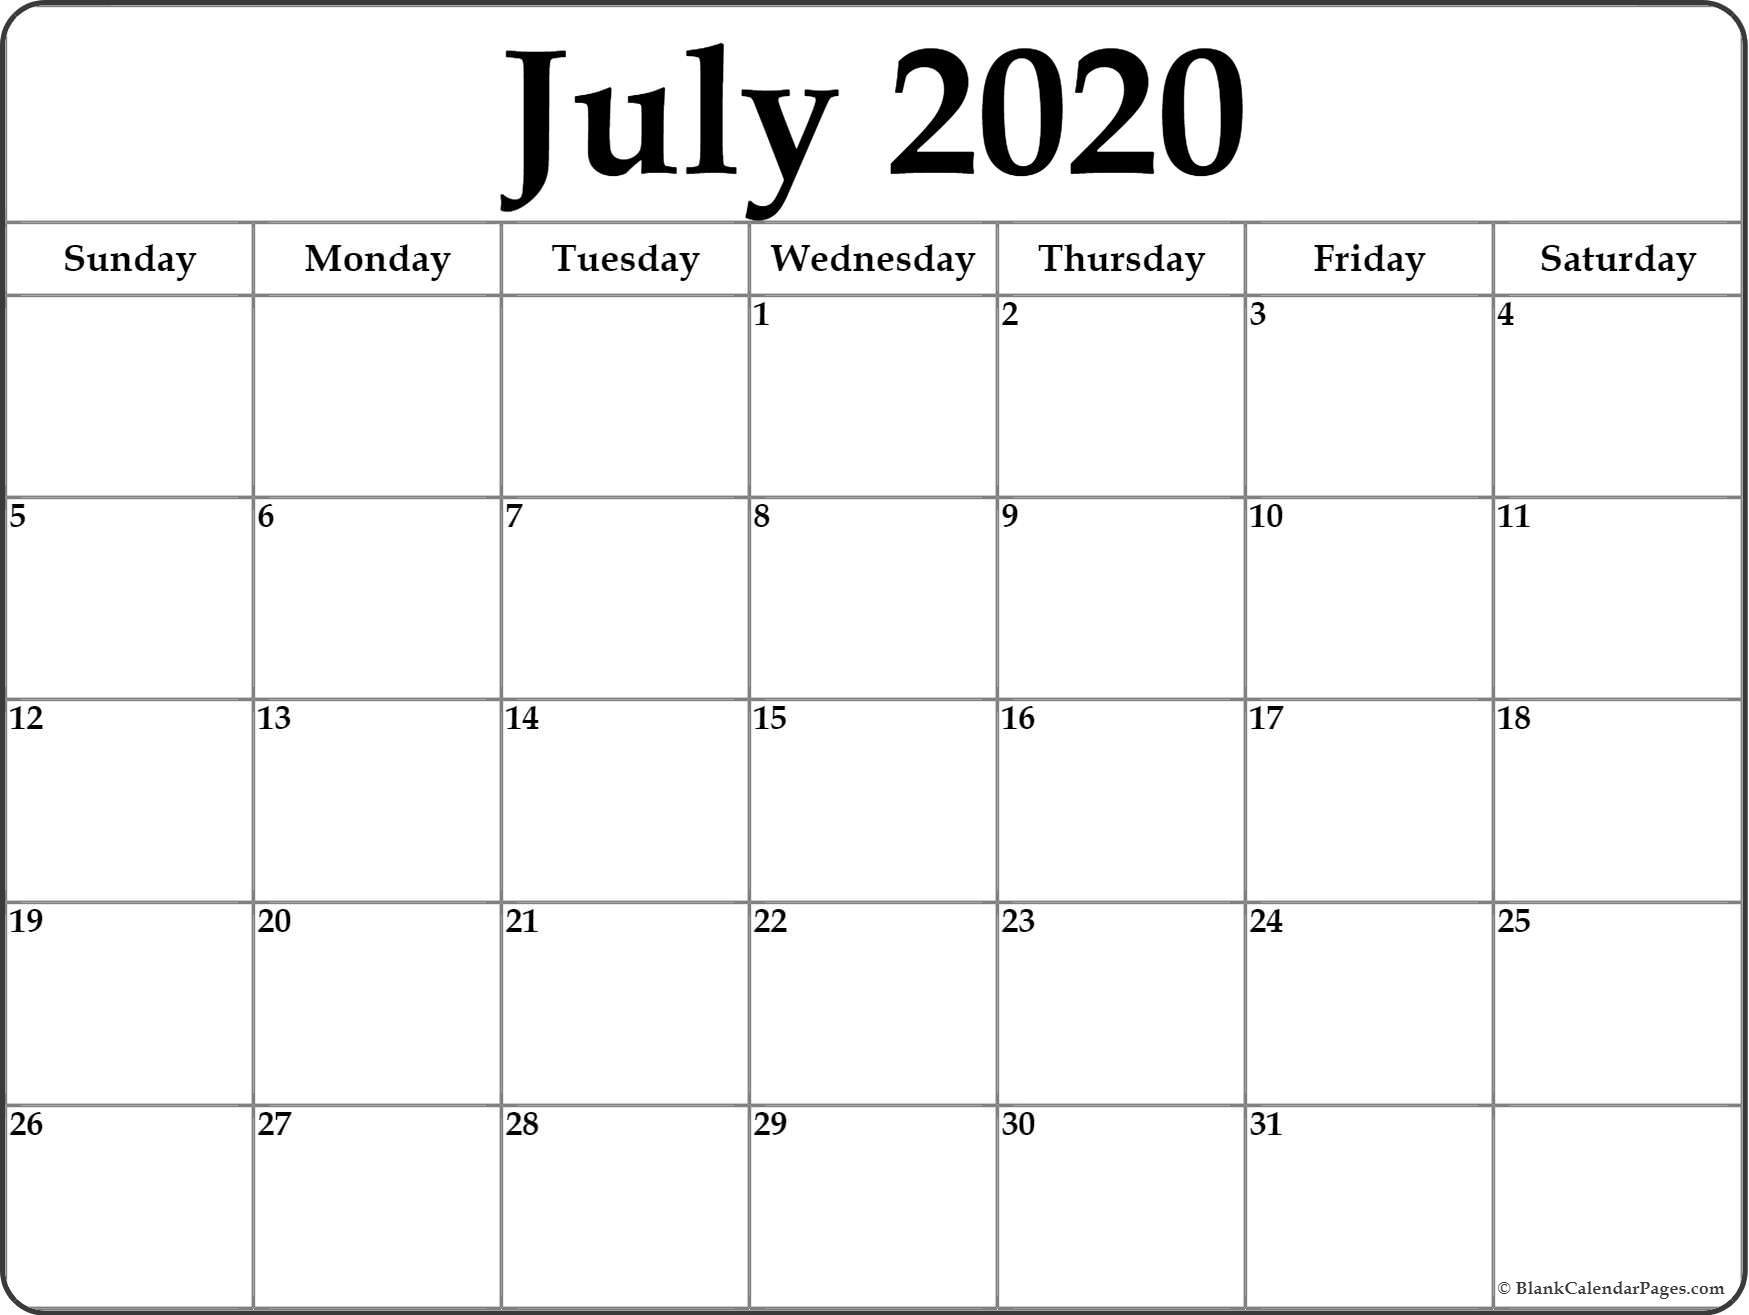 July 2020 Calendar | Free Printable Monthly Calendars-Monthly Calendar June-July 2020